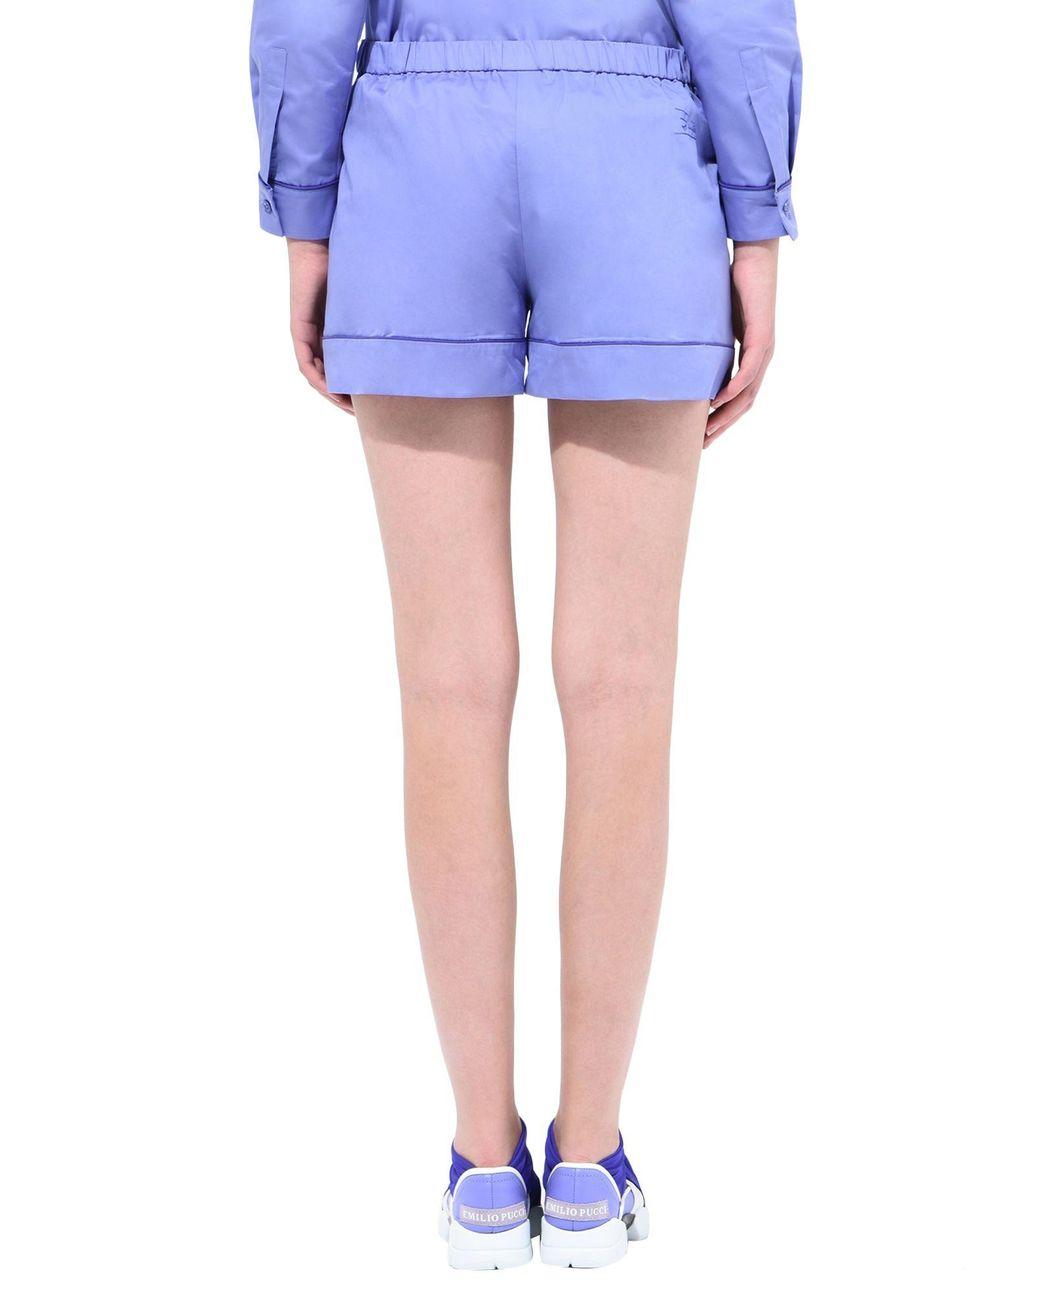 NWT $1040 Brunello Cucinelli Women/'s Olive Green Textured Shorts 100/% Cotton